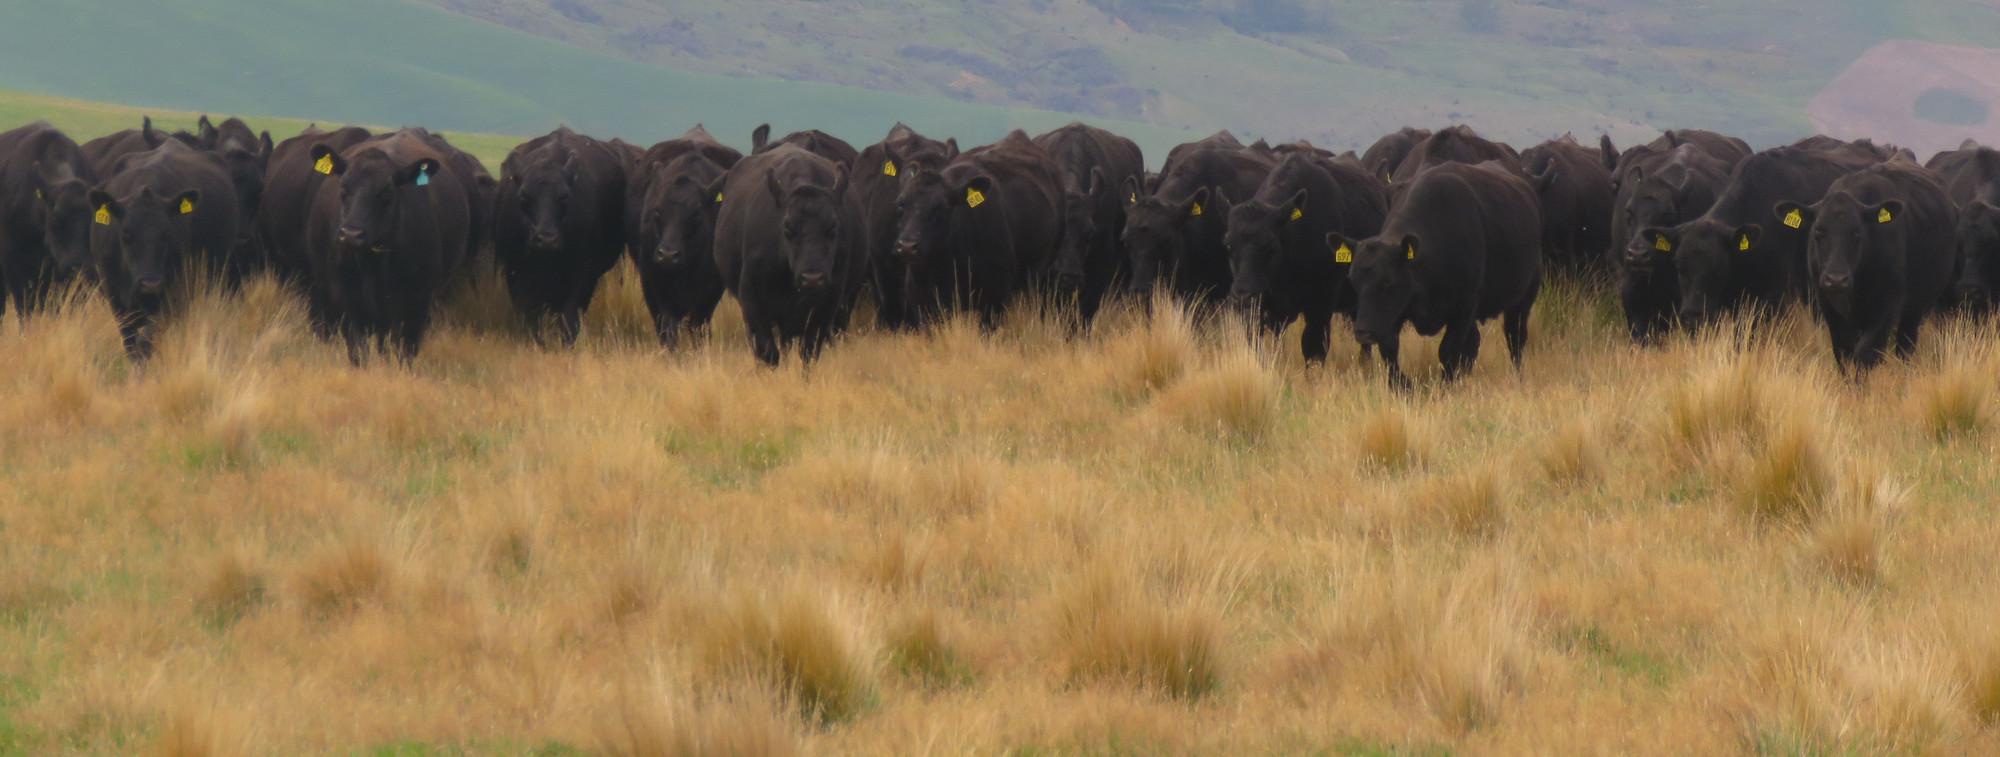 Harvie Green Wyatt help with farm succession planning